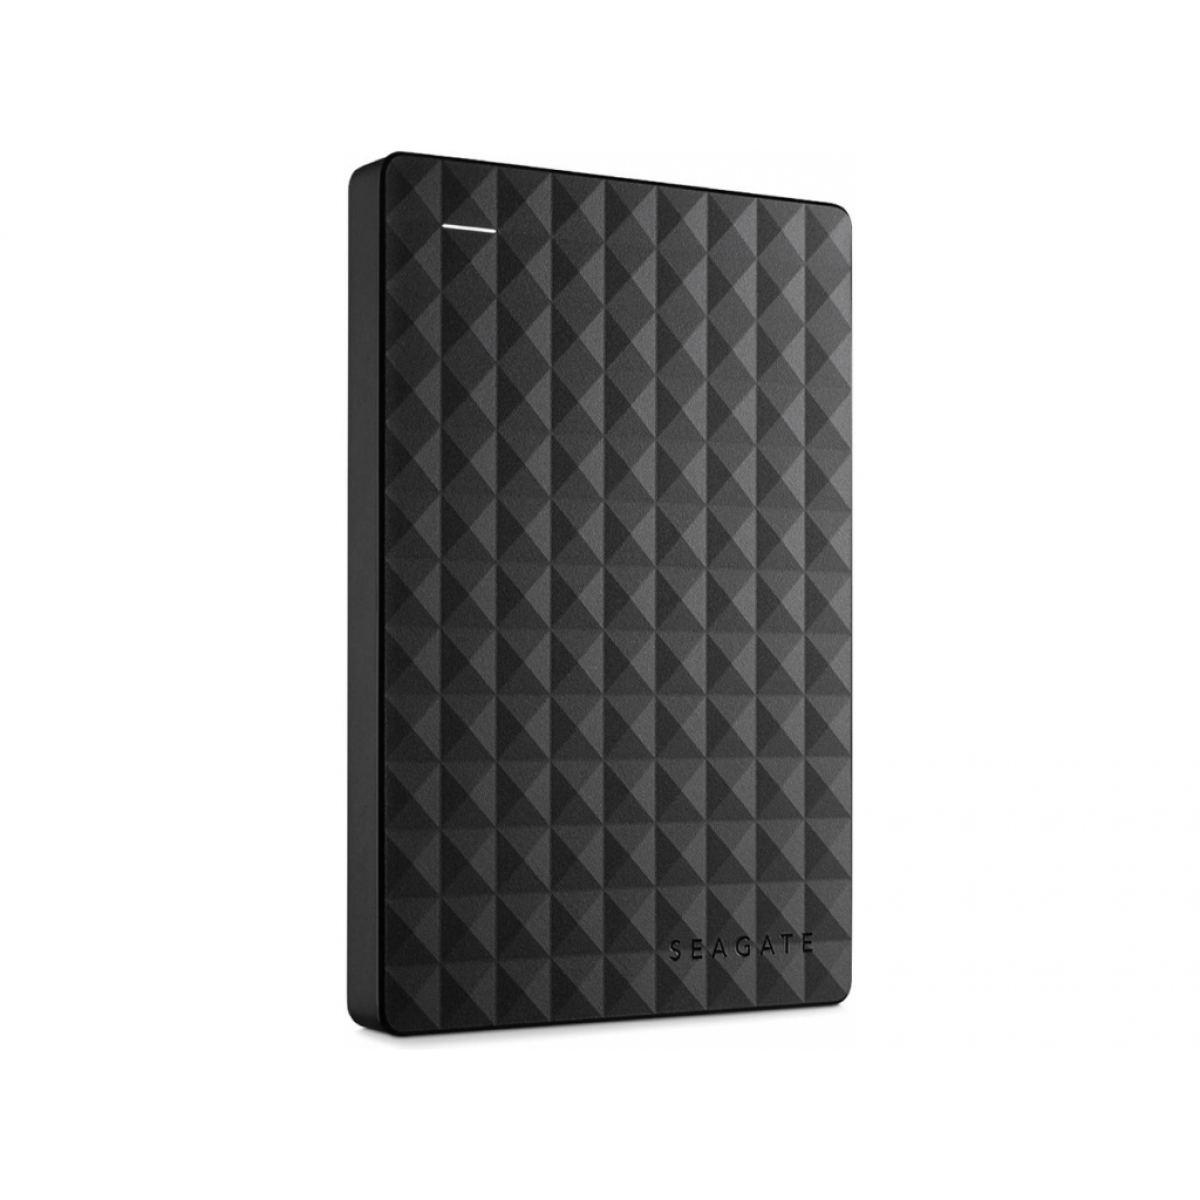 Портативный внешний жесткий диск Seagate HDD Seagate 2 TB Expansion, 2.5